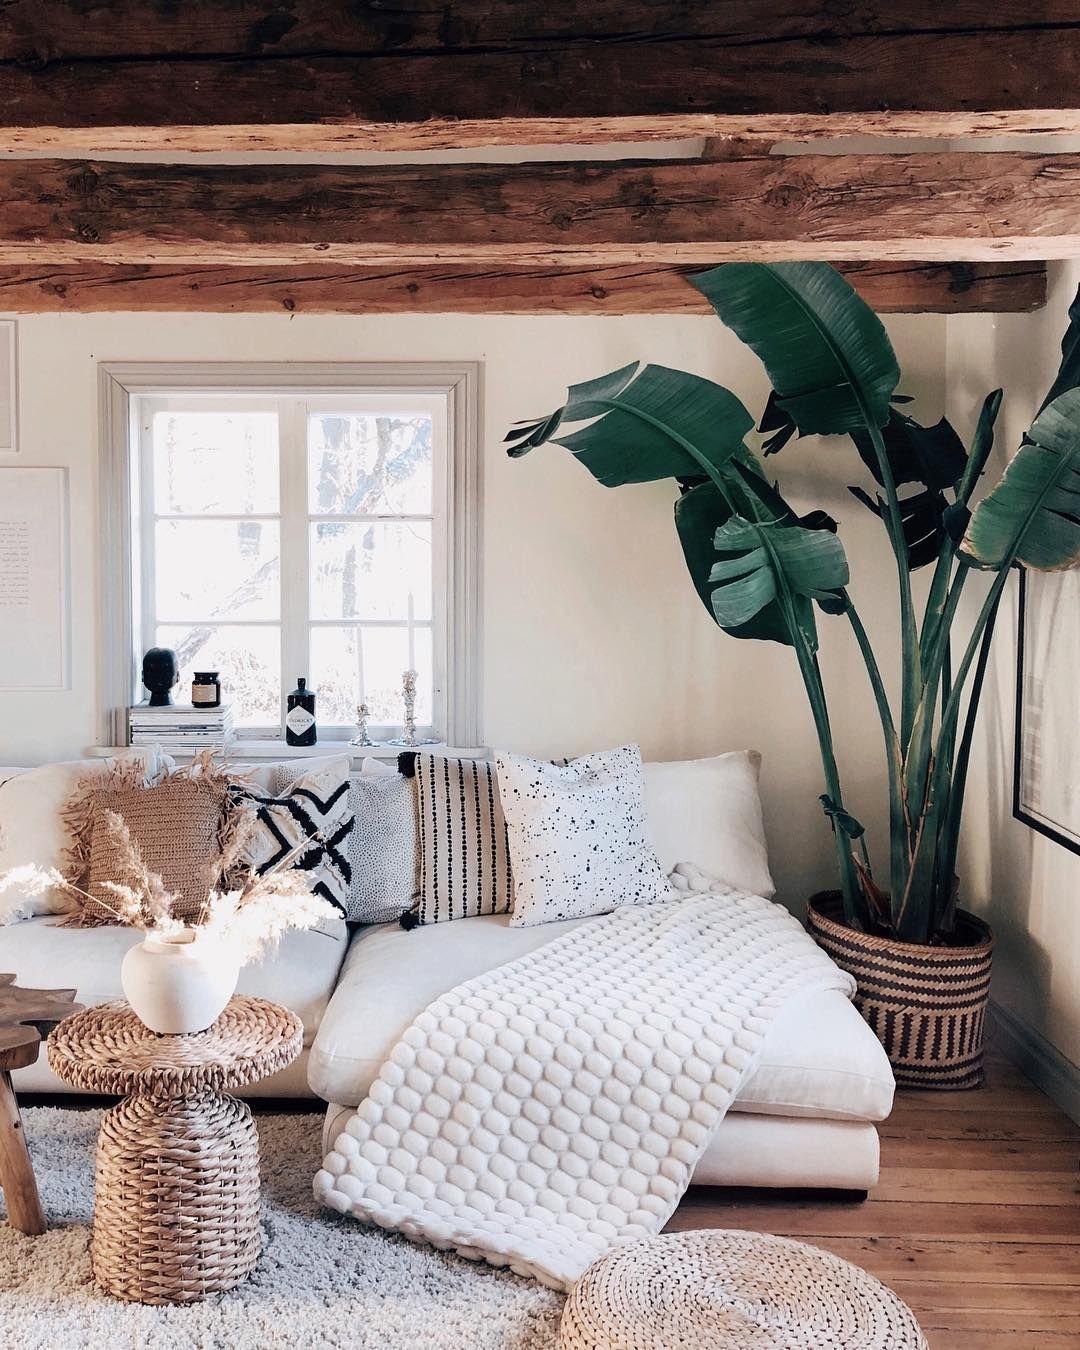 40+ Most Beautiful Living Room Ideas 2019 – hairstylesofwomens. com